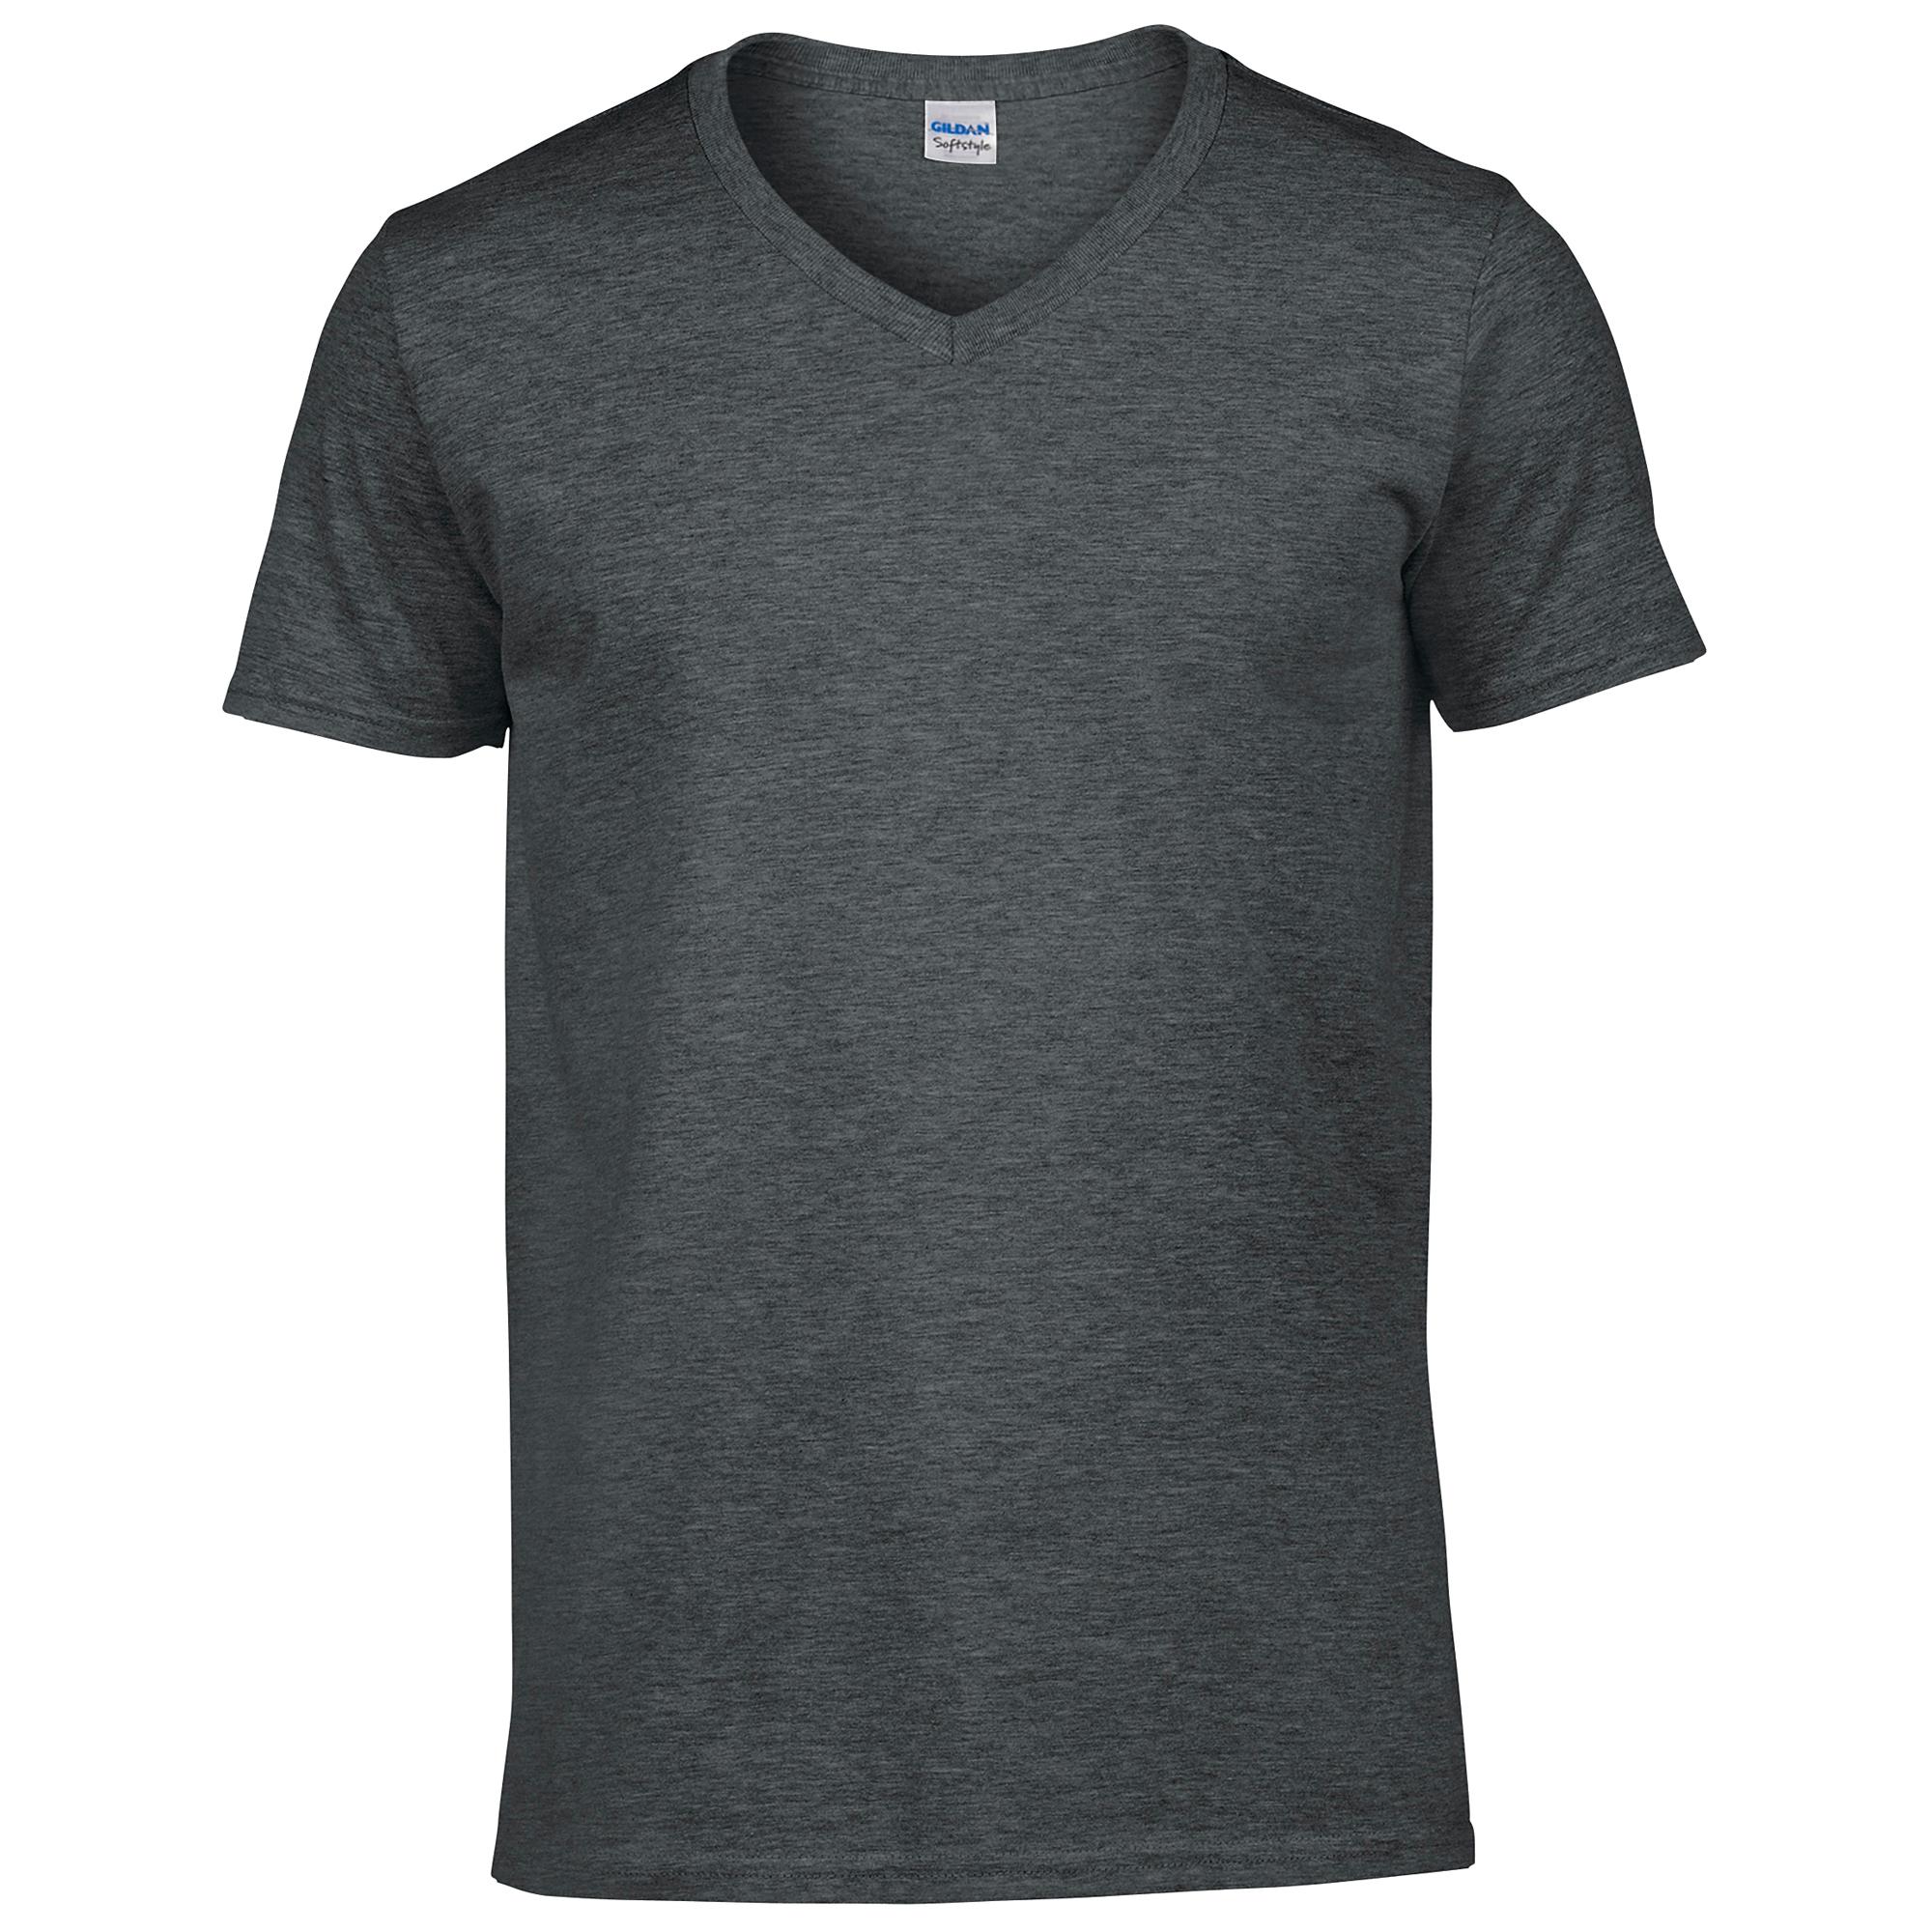 gildan soft style t shirt f r m nner v ausschnitt kurzarm. Black Bedroom Furniture Sets. Home Design Ideas